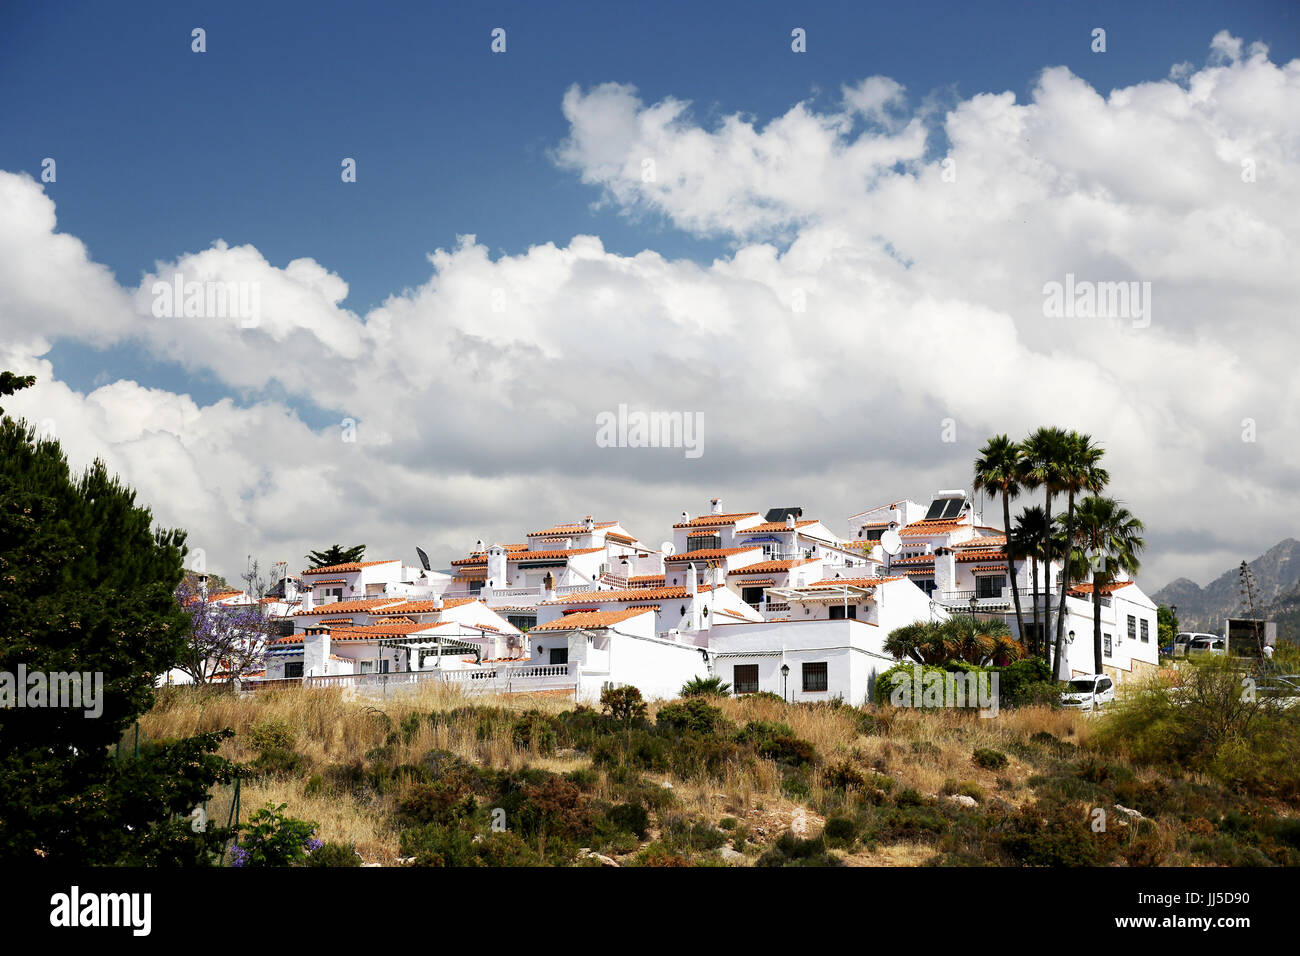 A view of a housing development in Alumenecar, Andalusia, Spain, Costa del Sol, Mediterranean, Spain. Stock Photo